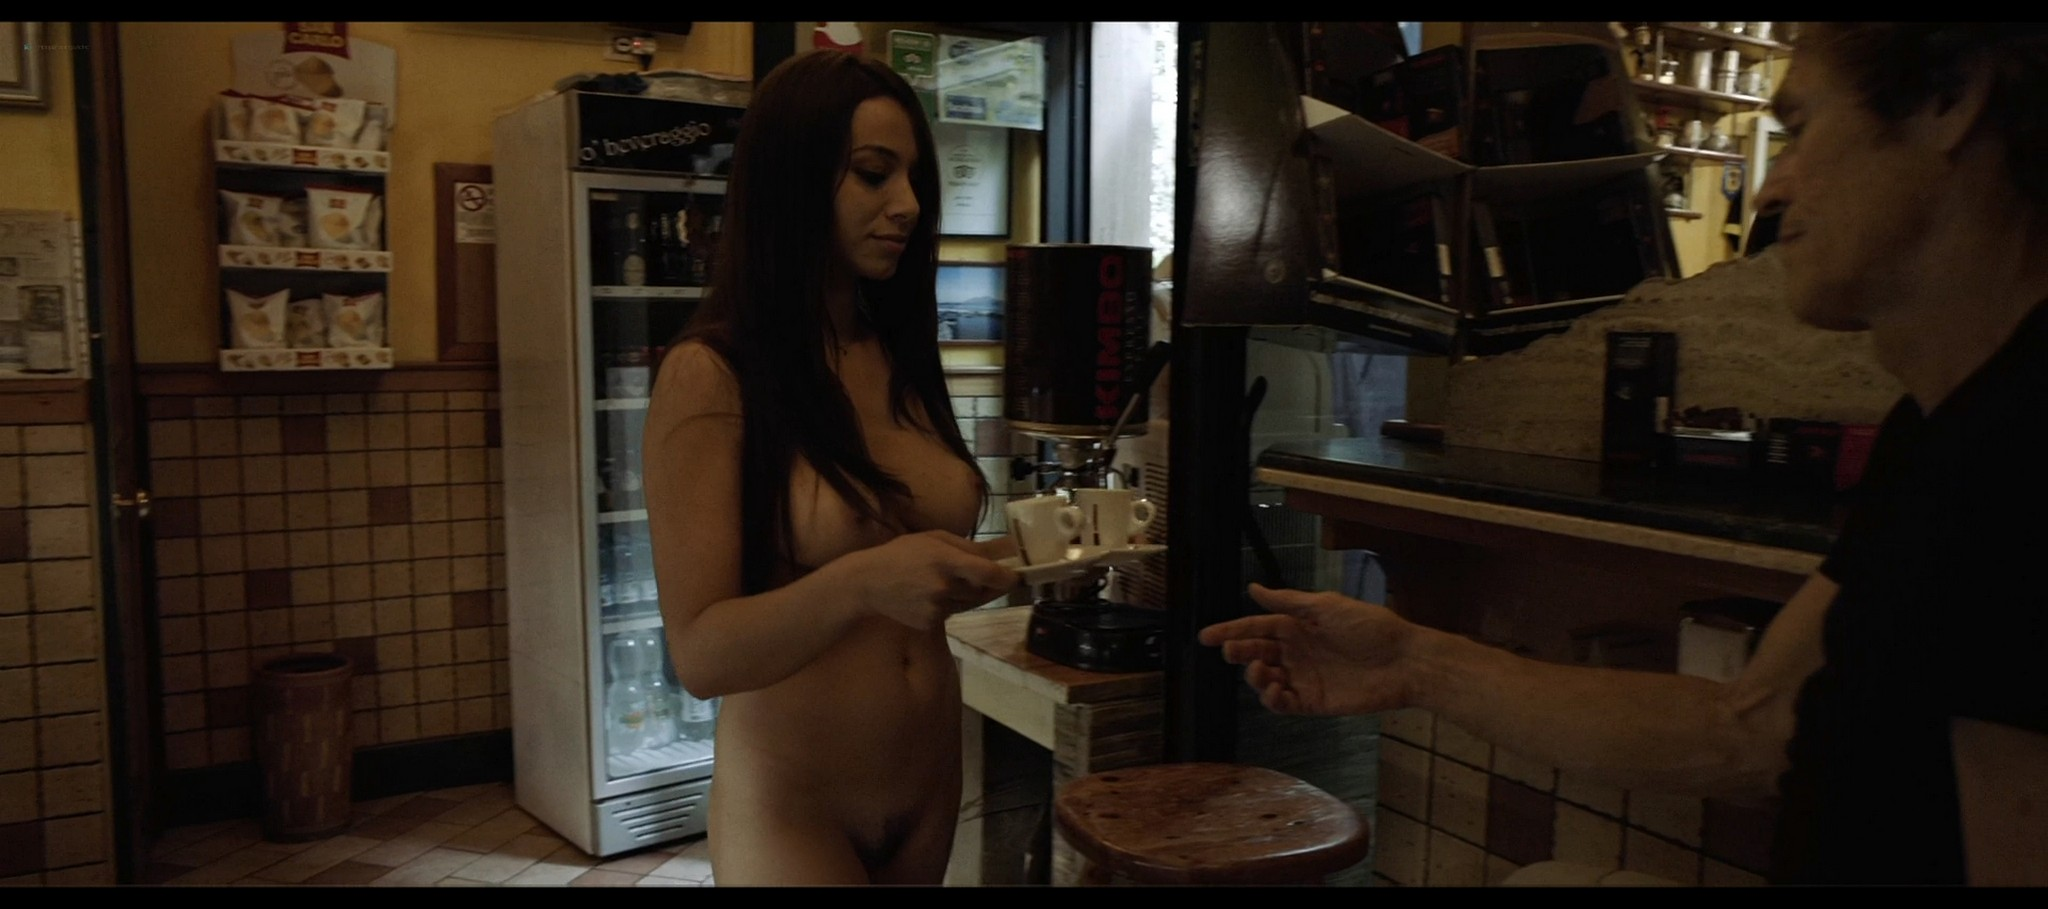 Cristina Chiriac nude full frontal Sofia Rania Dharma Mangia Woods full frontal too Tommaso 2019 HD 1080p Bluray 004